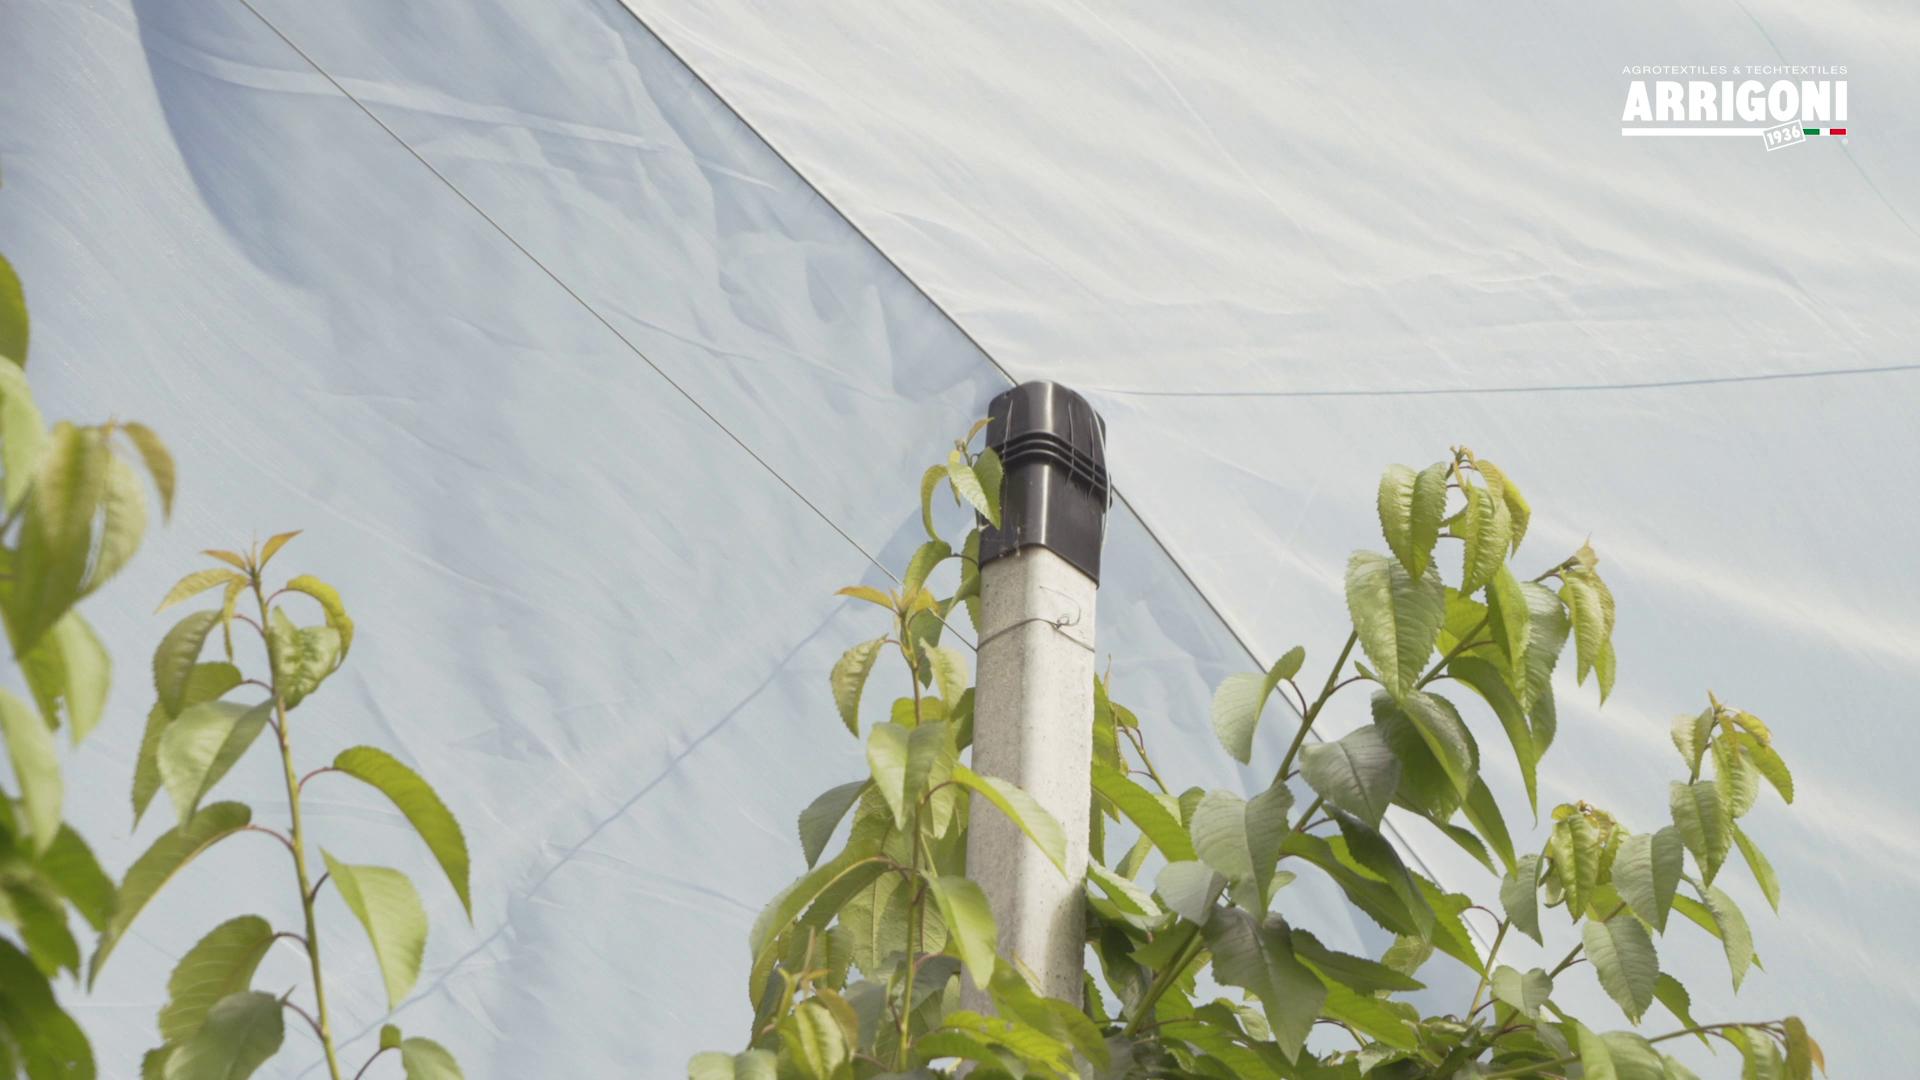 rain protection net